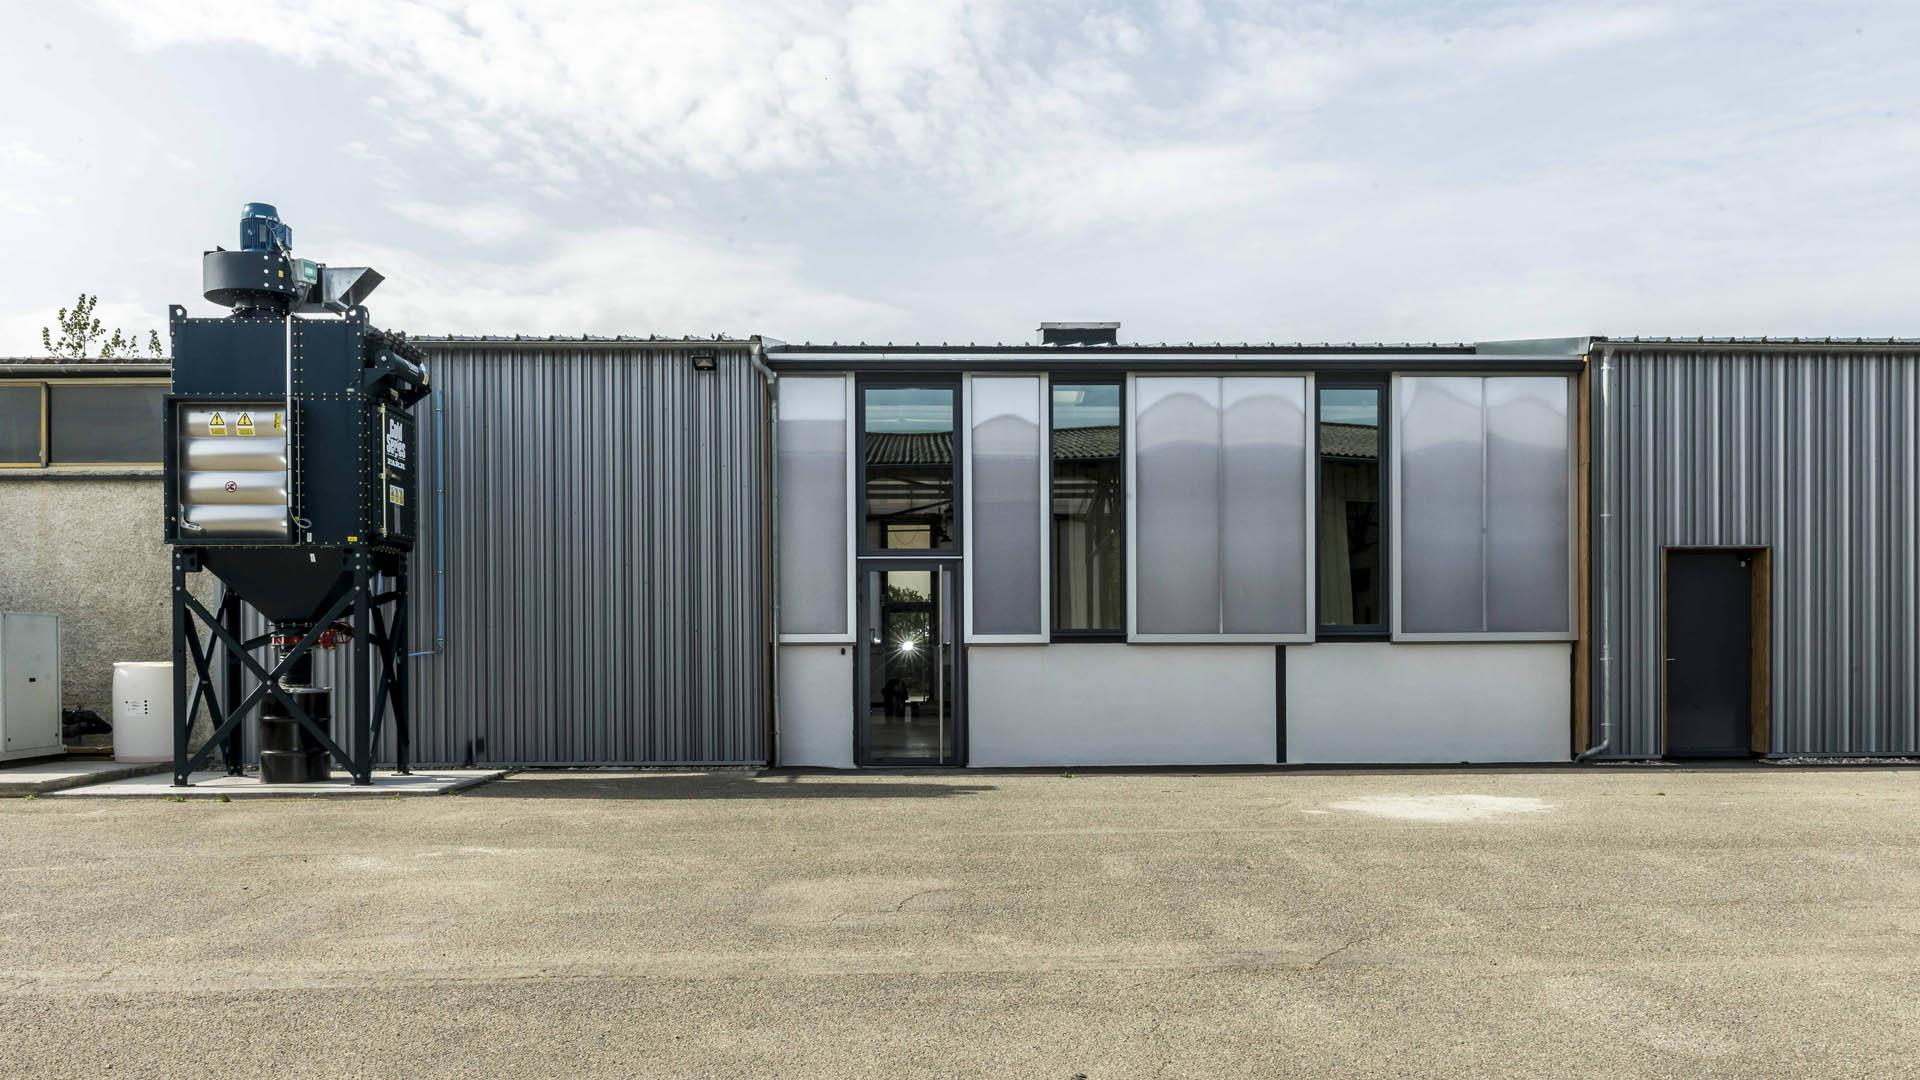 Seuil-architecture-Construction-Agro-écologie-04